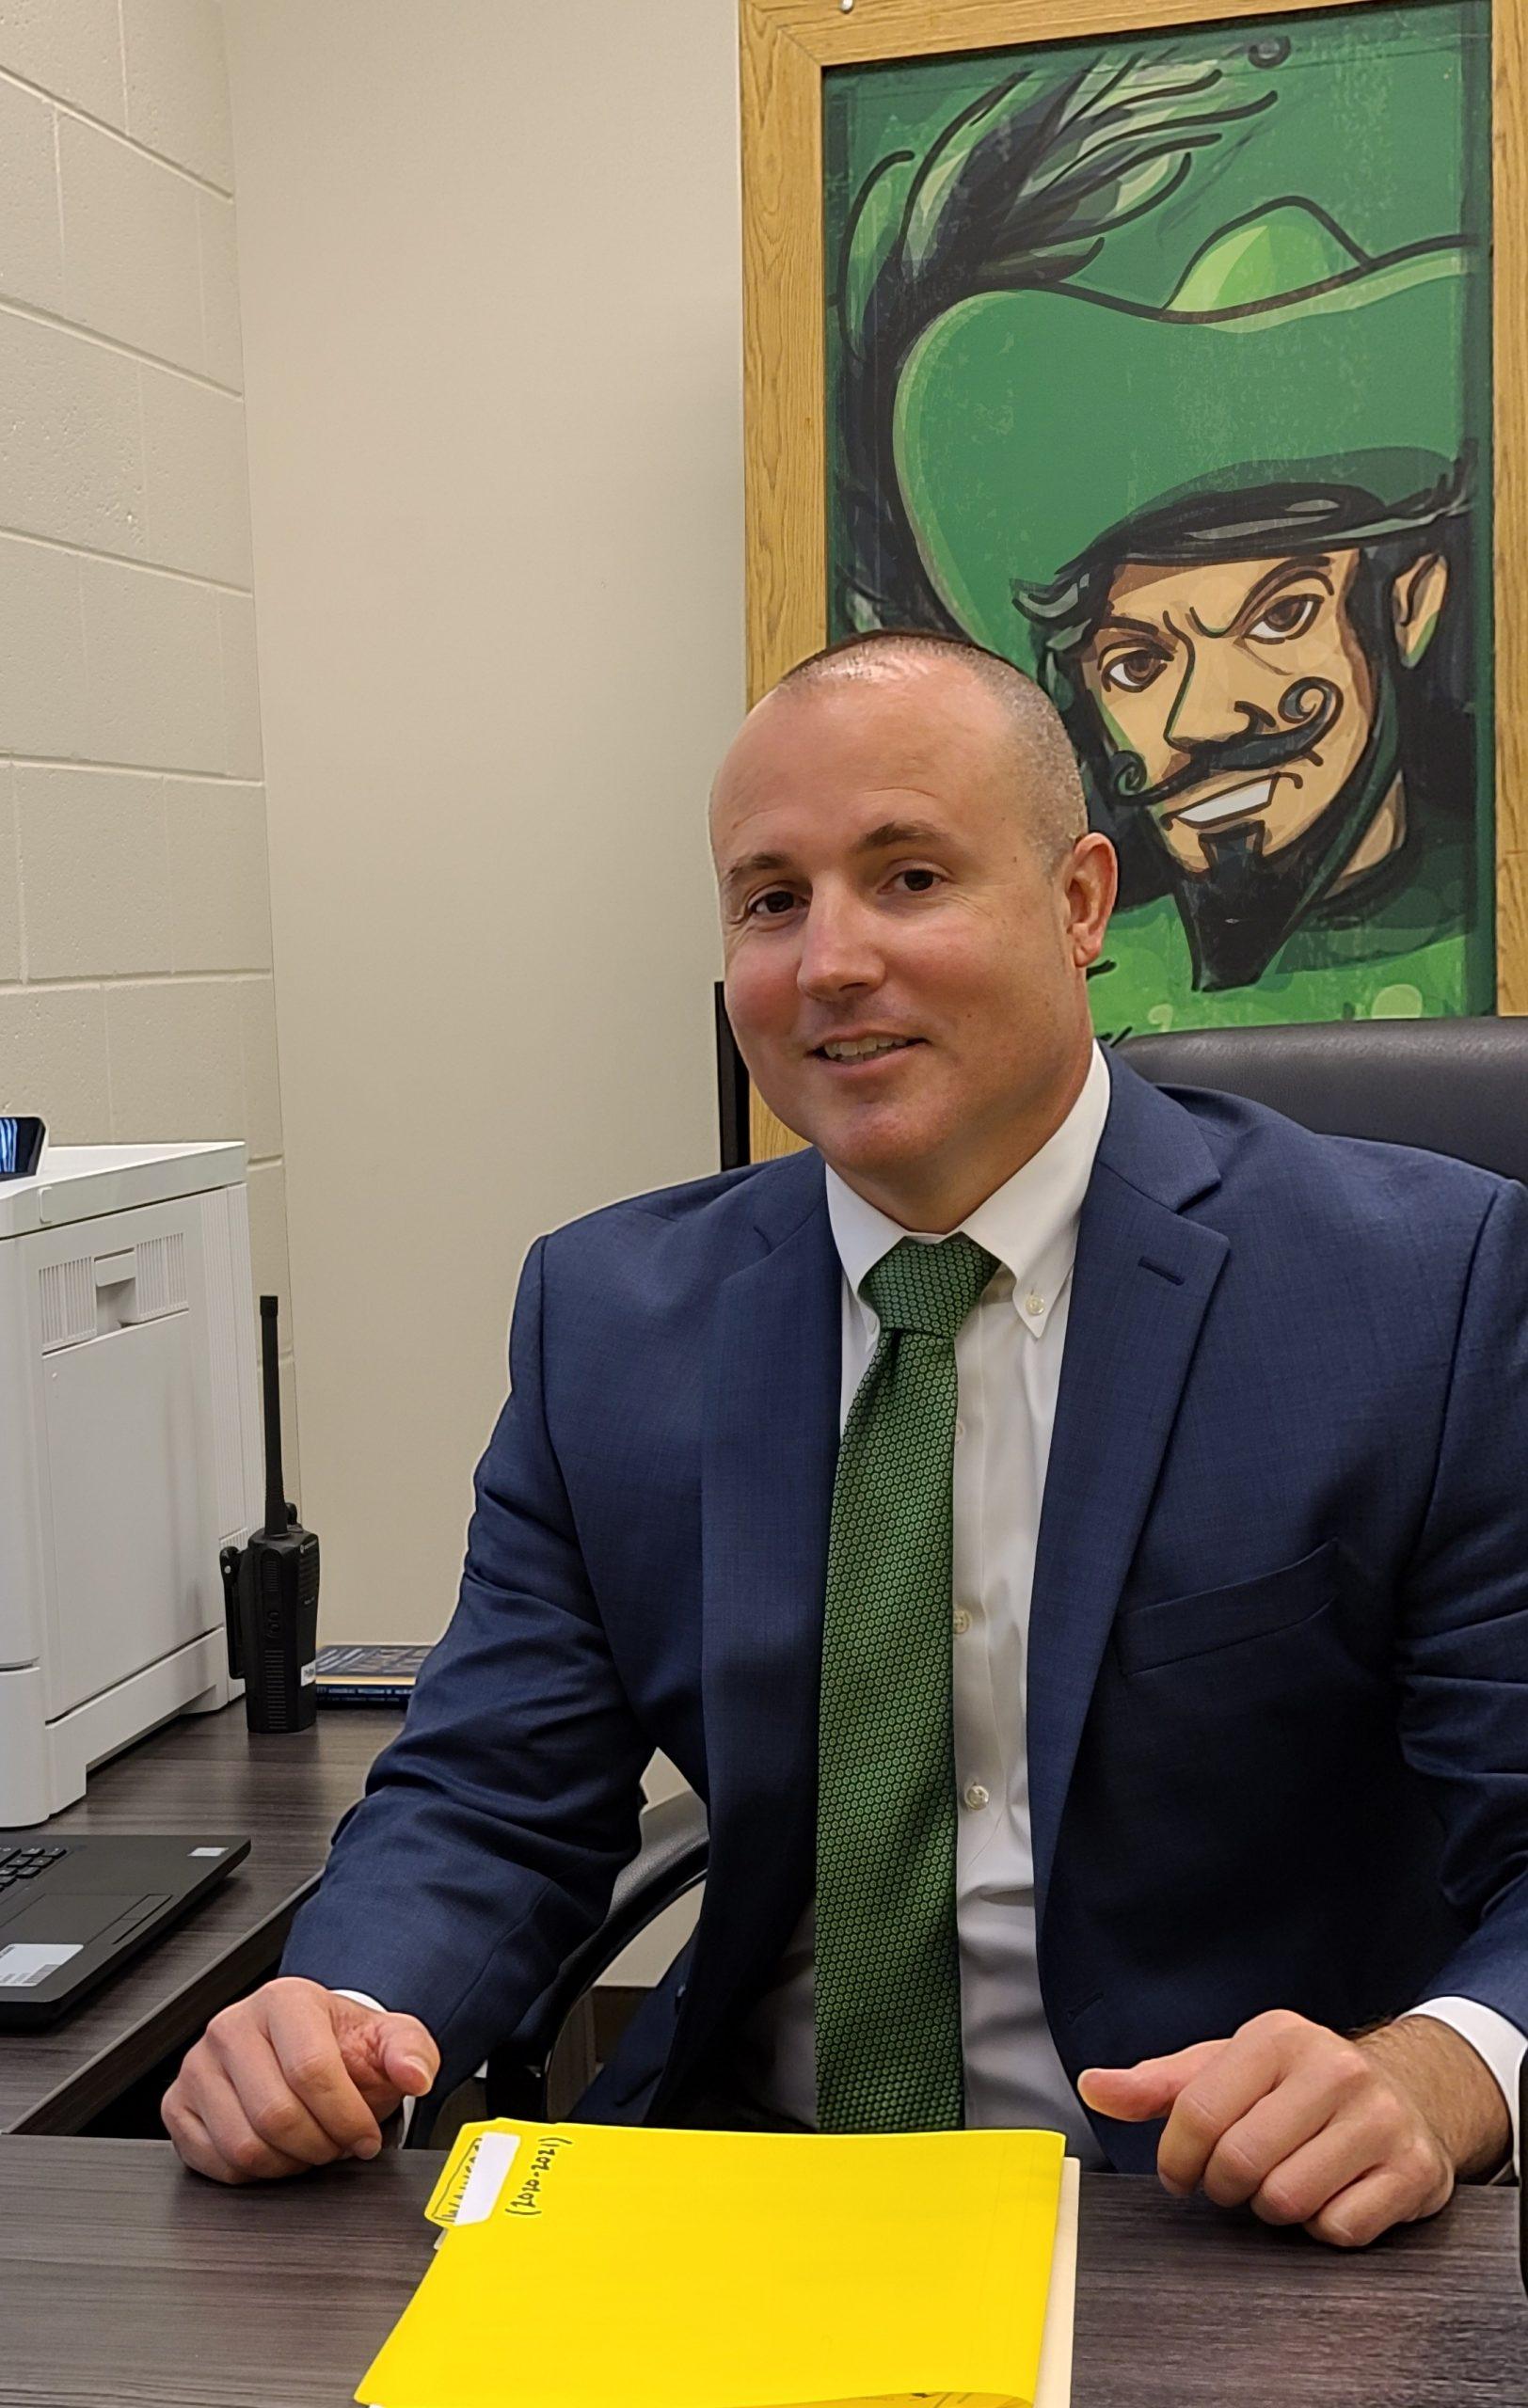 Principal sitting at his desk.